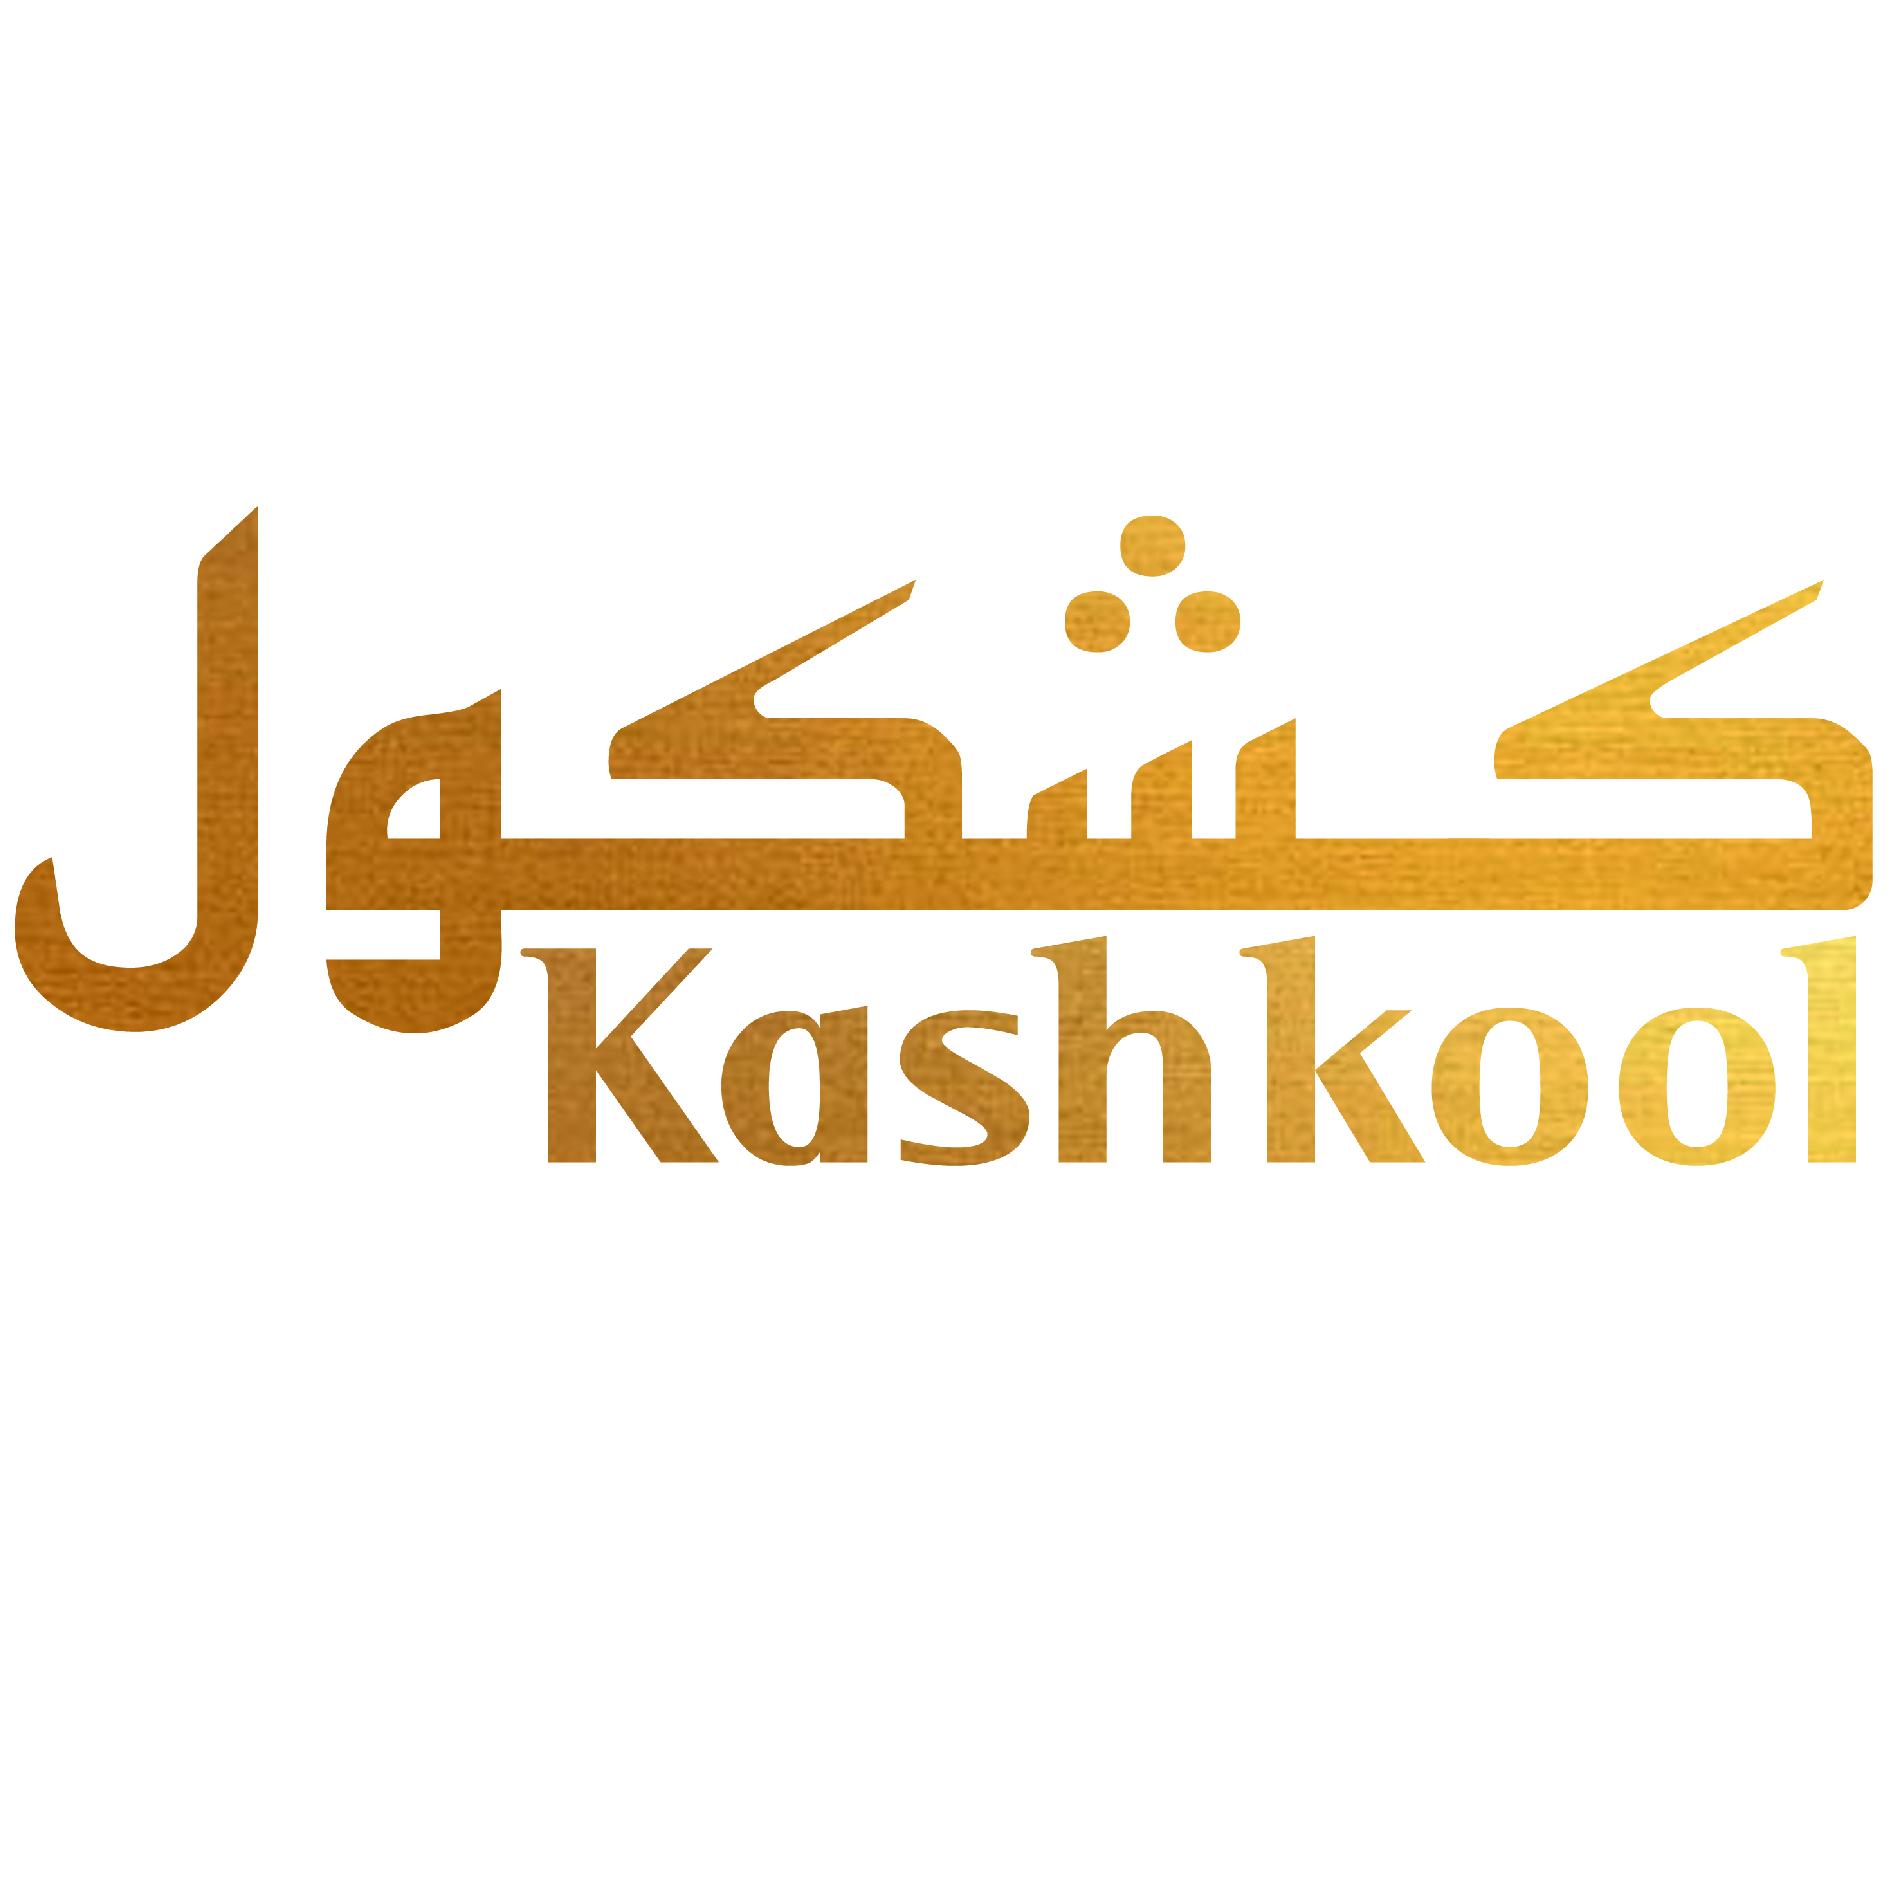 Kashkool